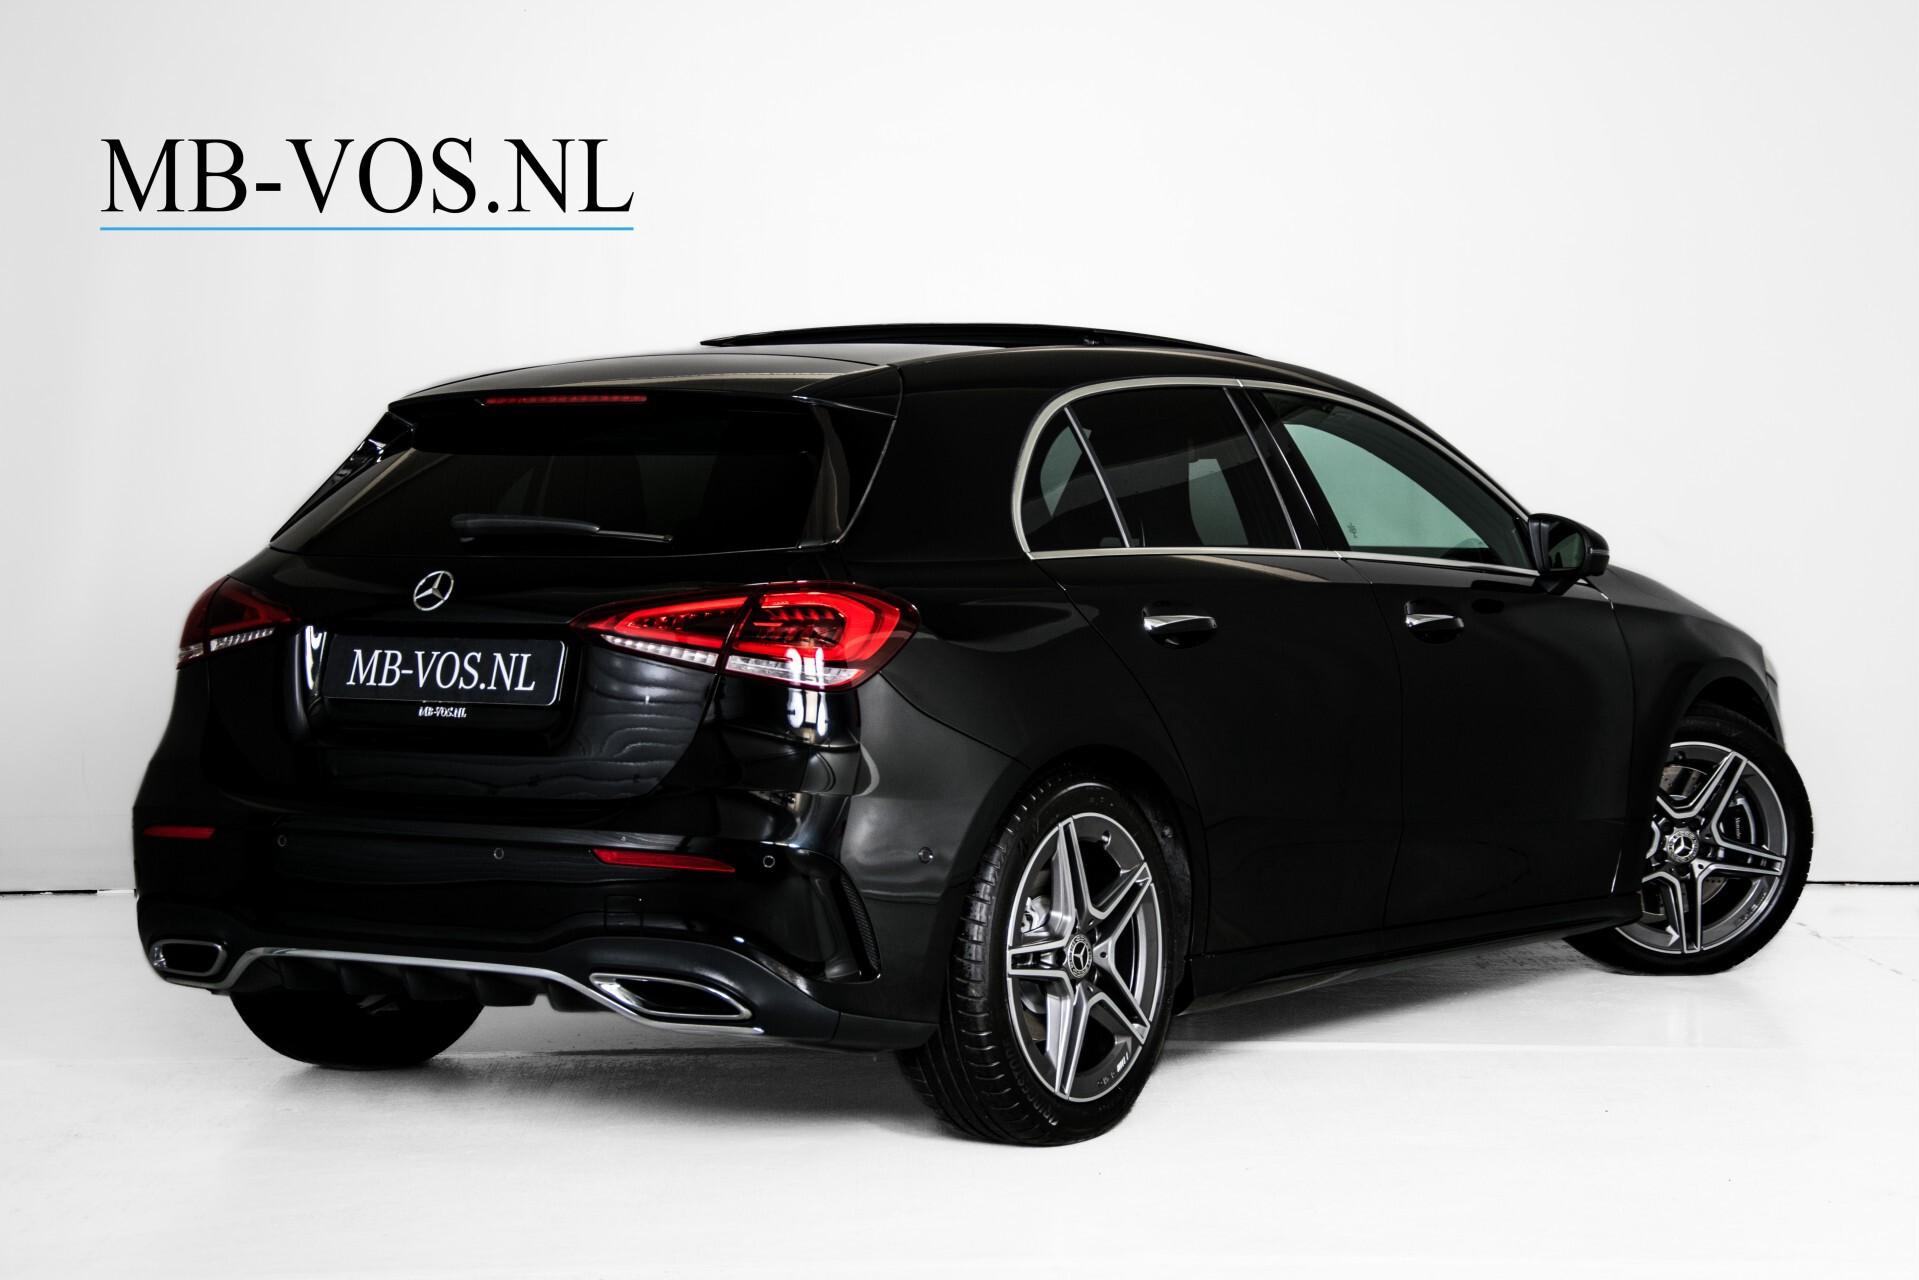 Mercedes-Benz A-Klasse 250 4-M AMG Panorama/Keyless-Entry/MBUX/HUD/Burmester/360/Multibeam LED Aut7 Foto 2